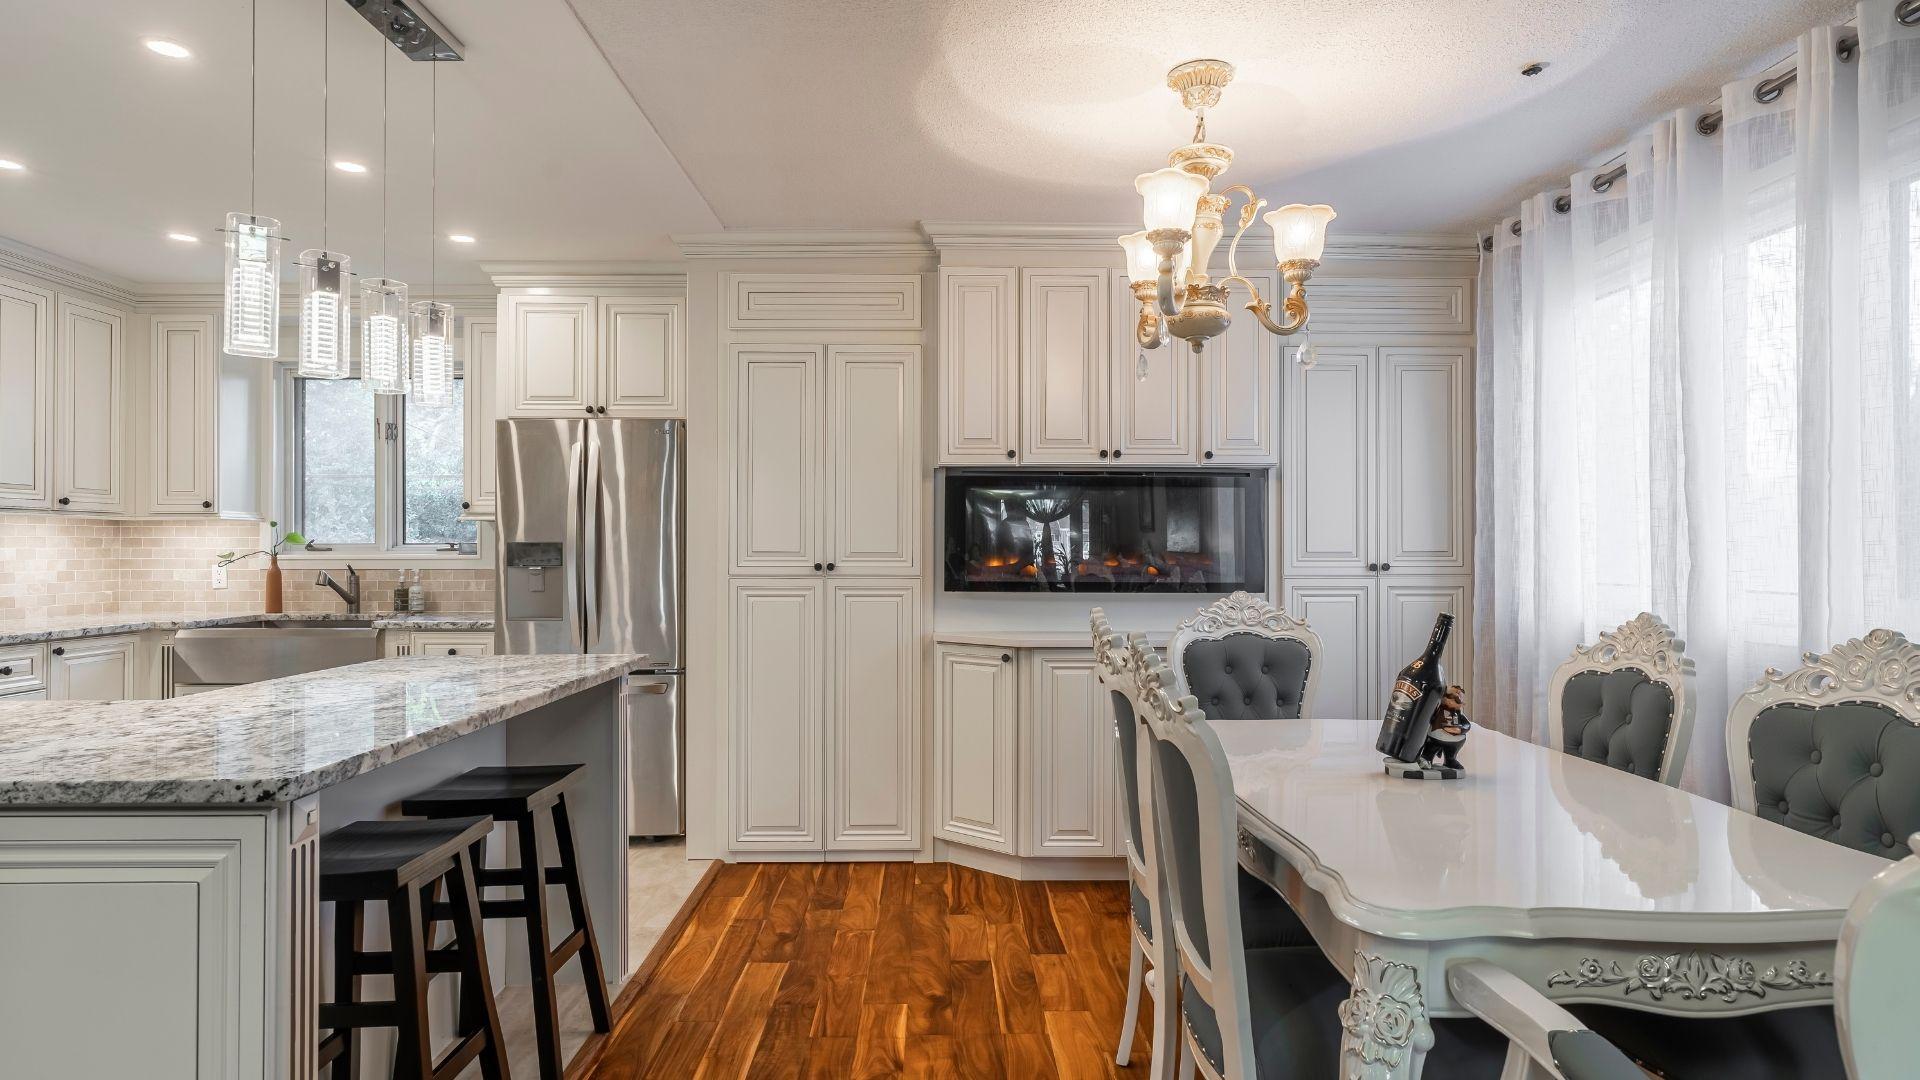 Pierrefonds kitchen renovation after